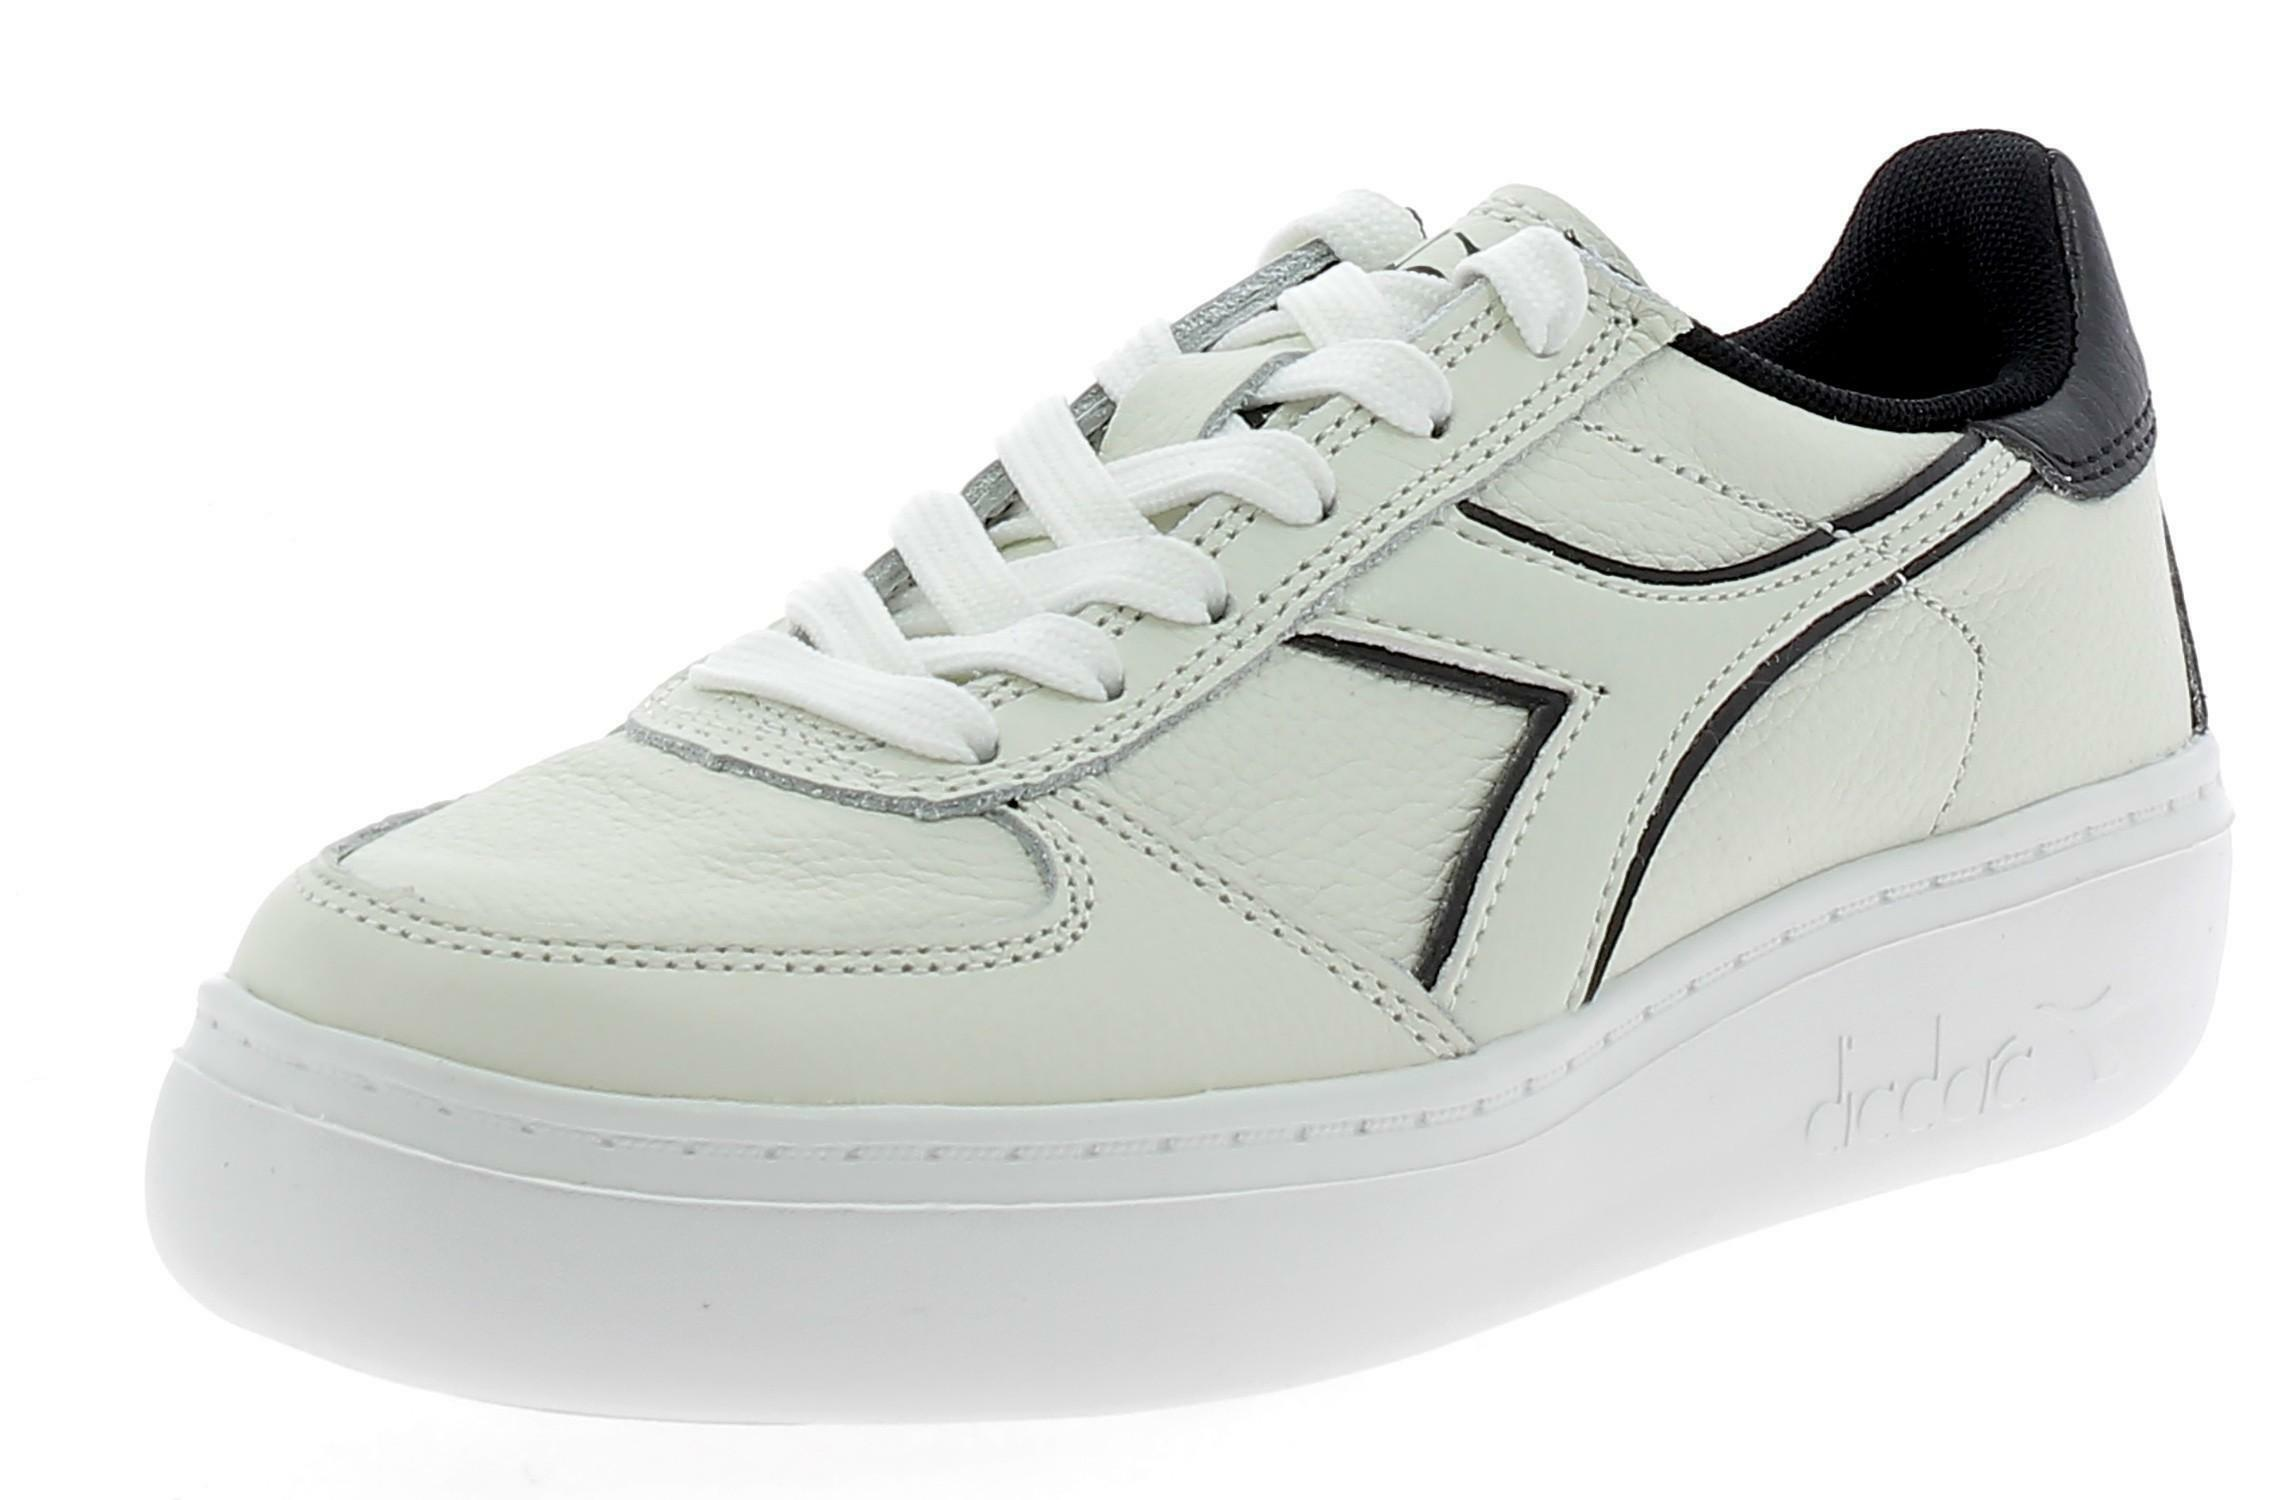 diadora diadora b.elite l wide scarpe sportive donna bianche 173733c0351